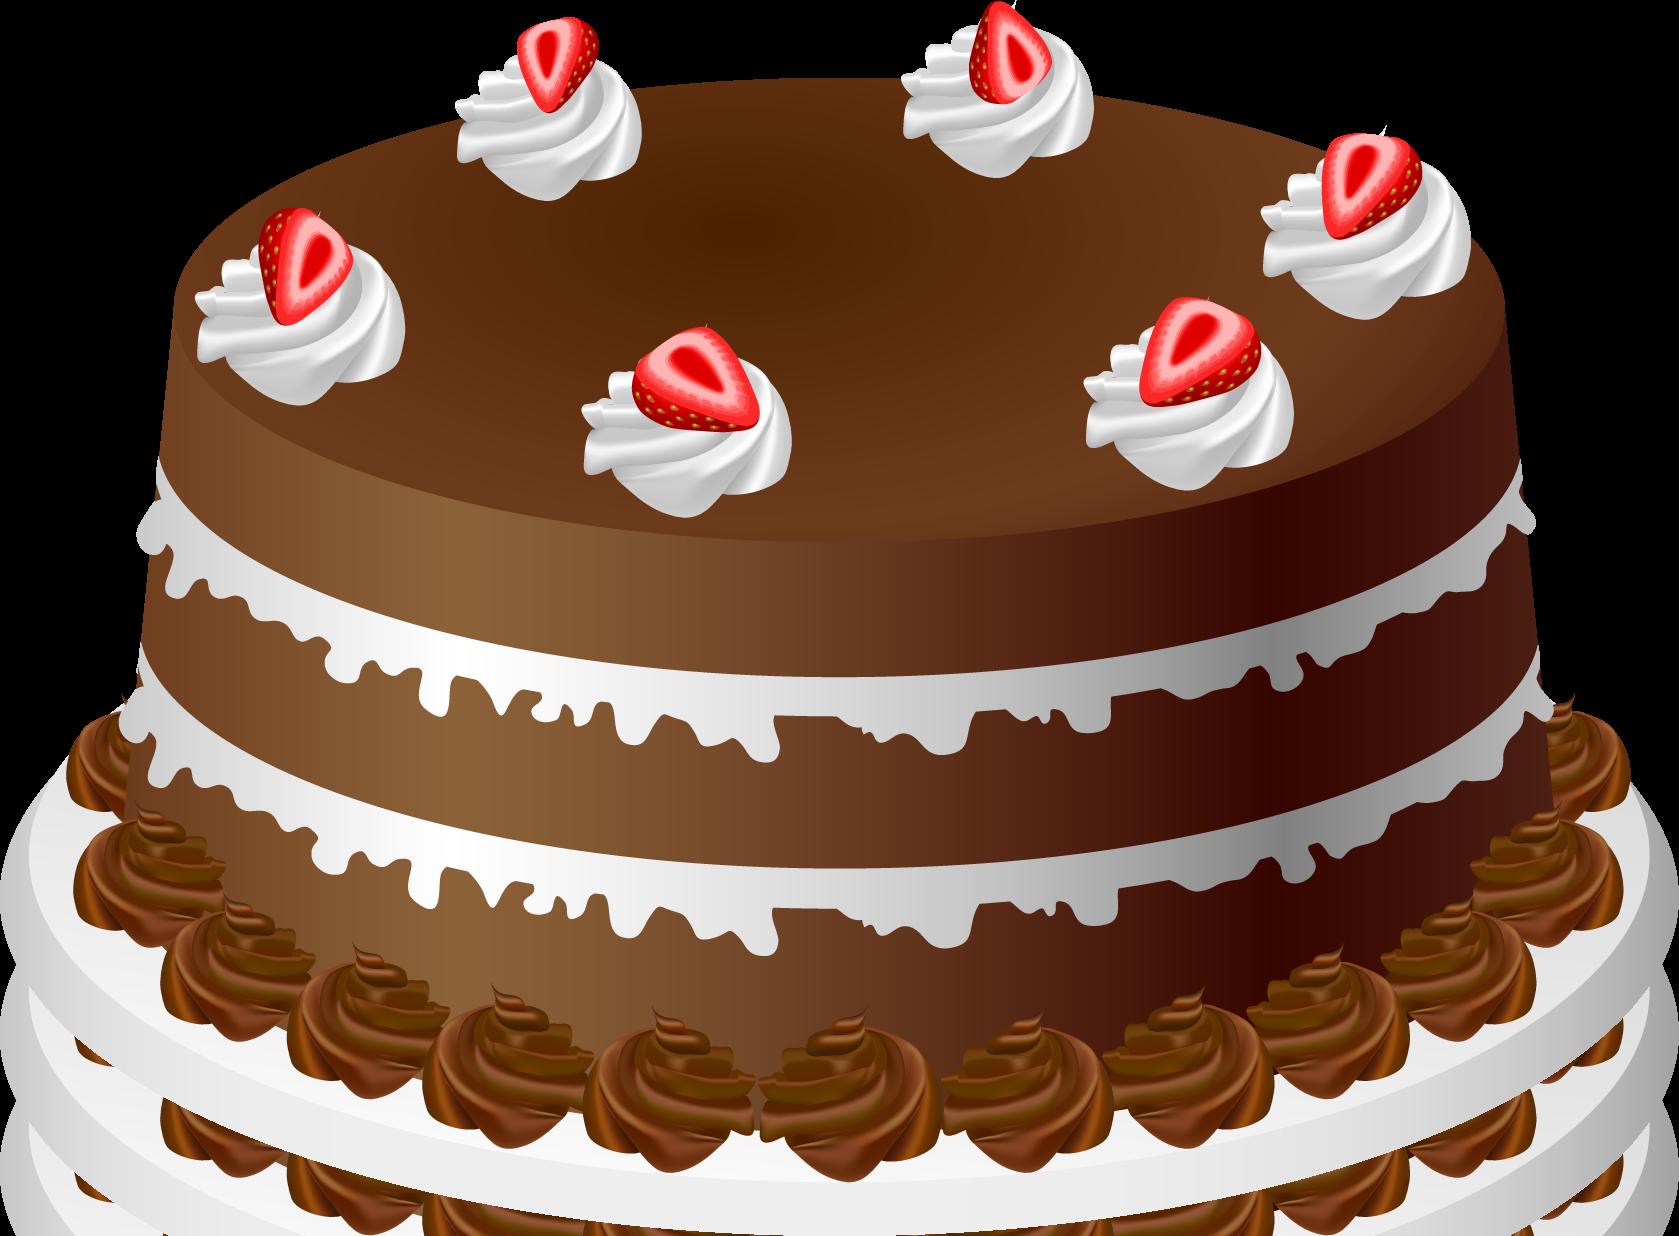 Dessert cakes clipart.